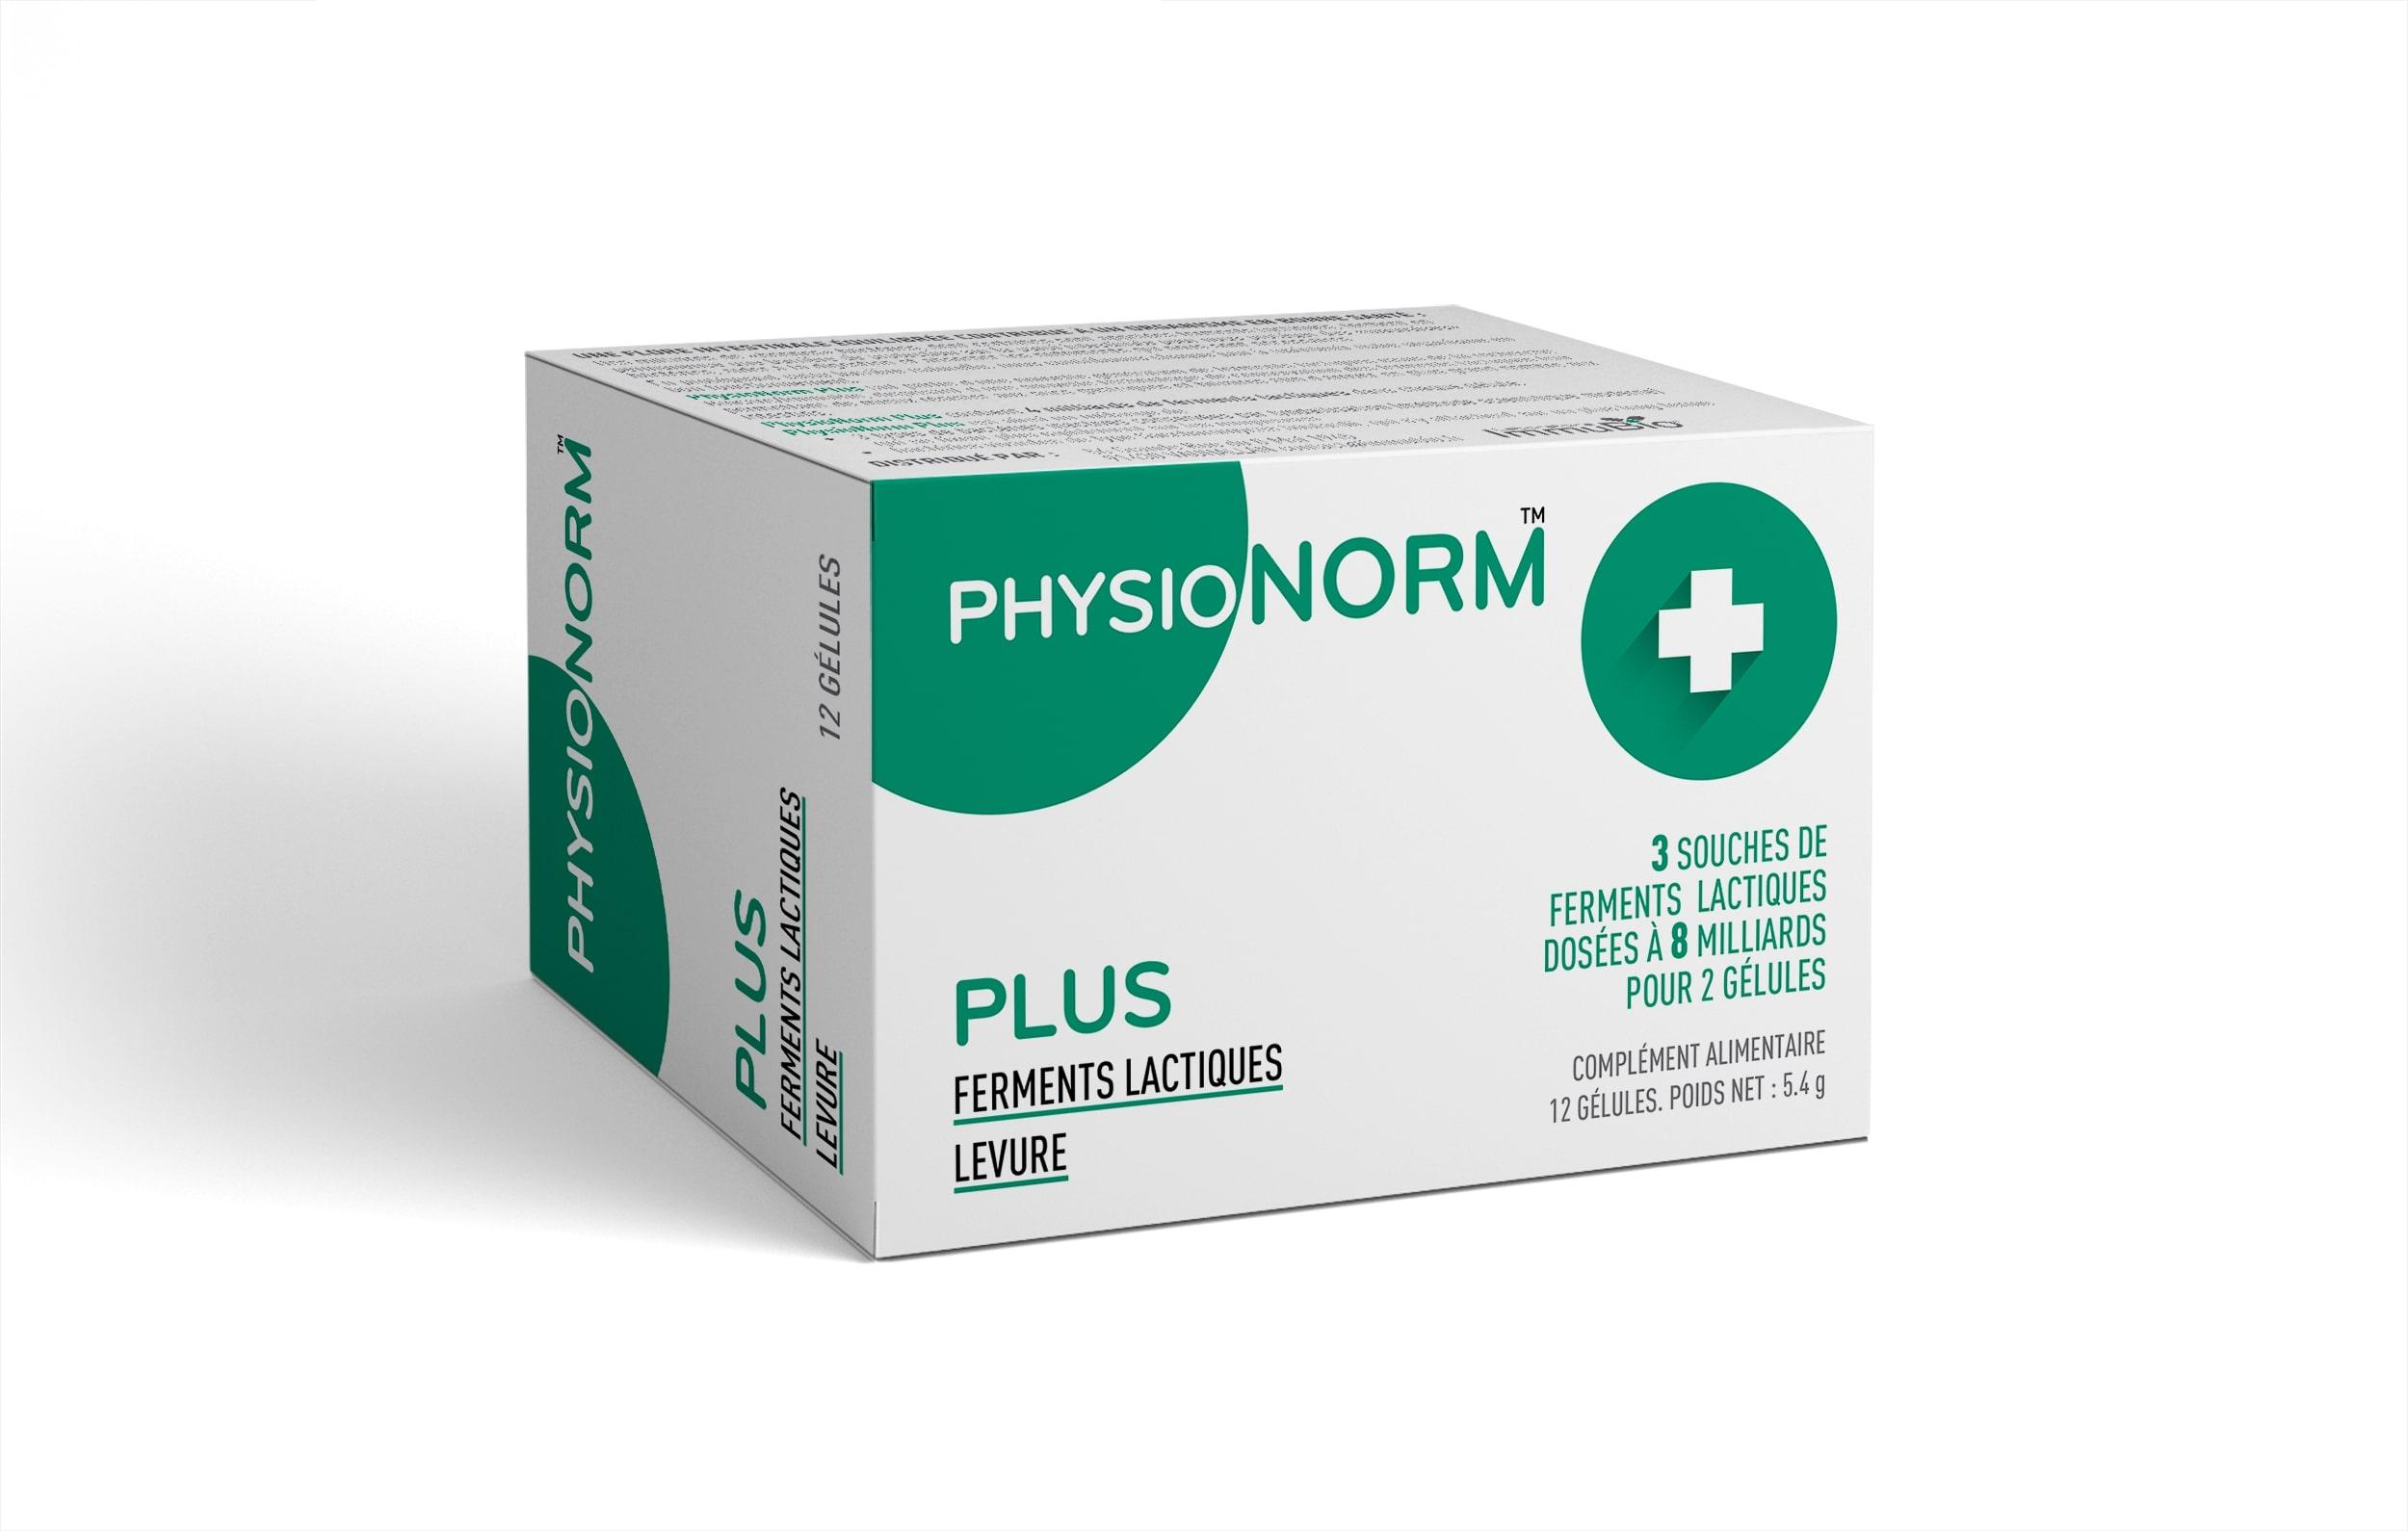 Laboratoire-Immubio-complement-alimentaire-PhysioNorm-PLUS